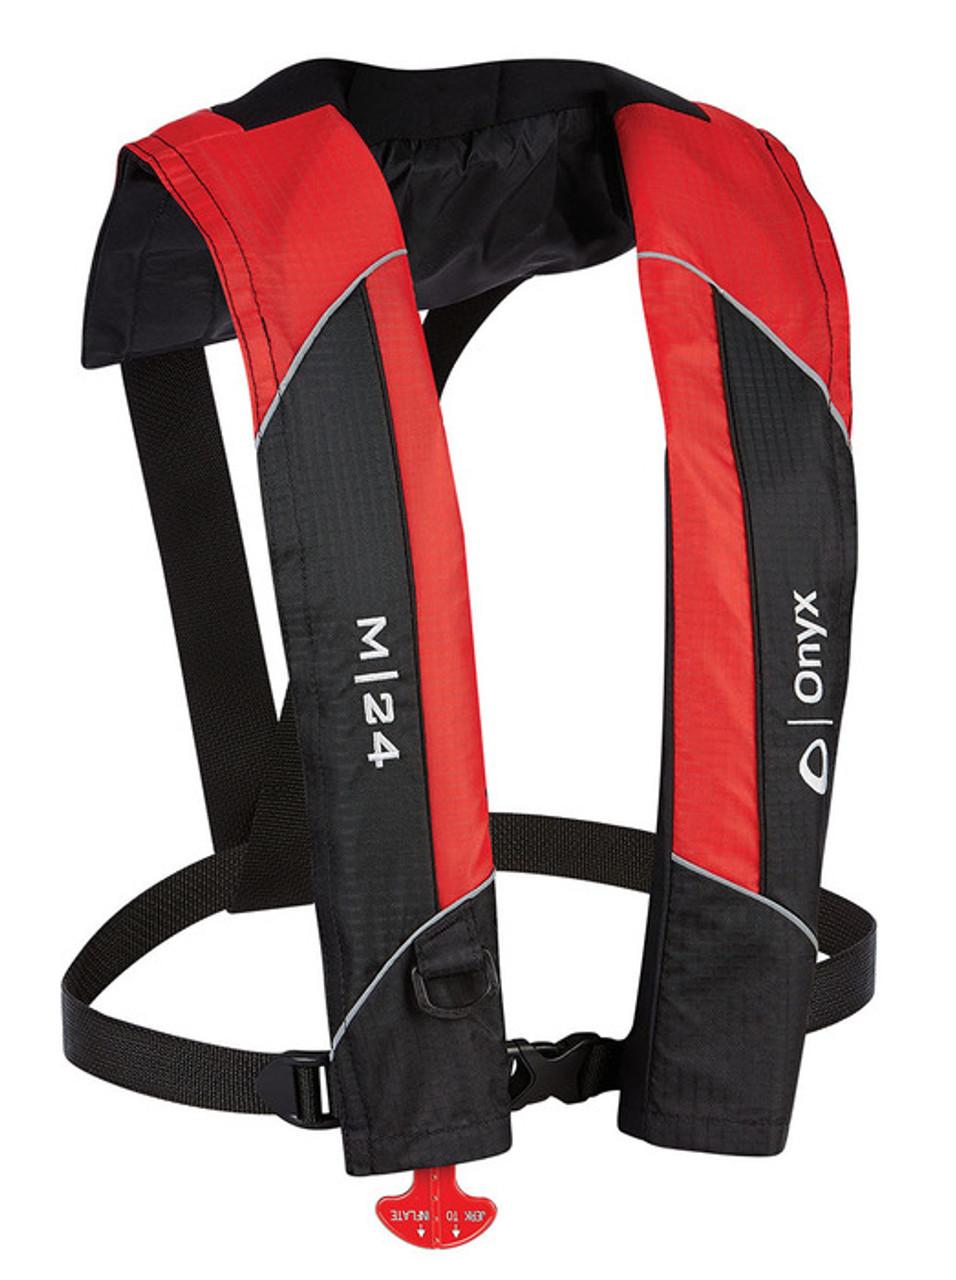 M-24 - Manual Inflatable Life Jacket